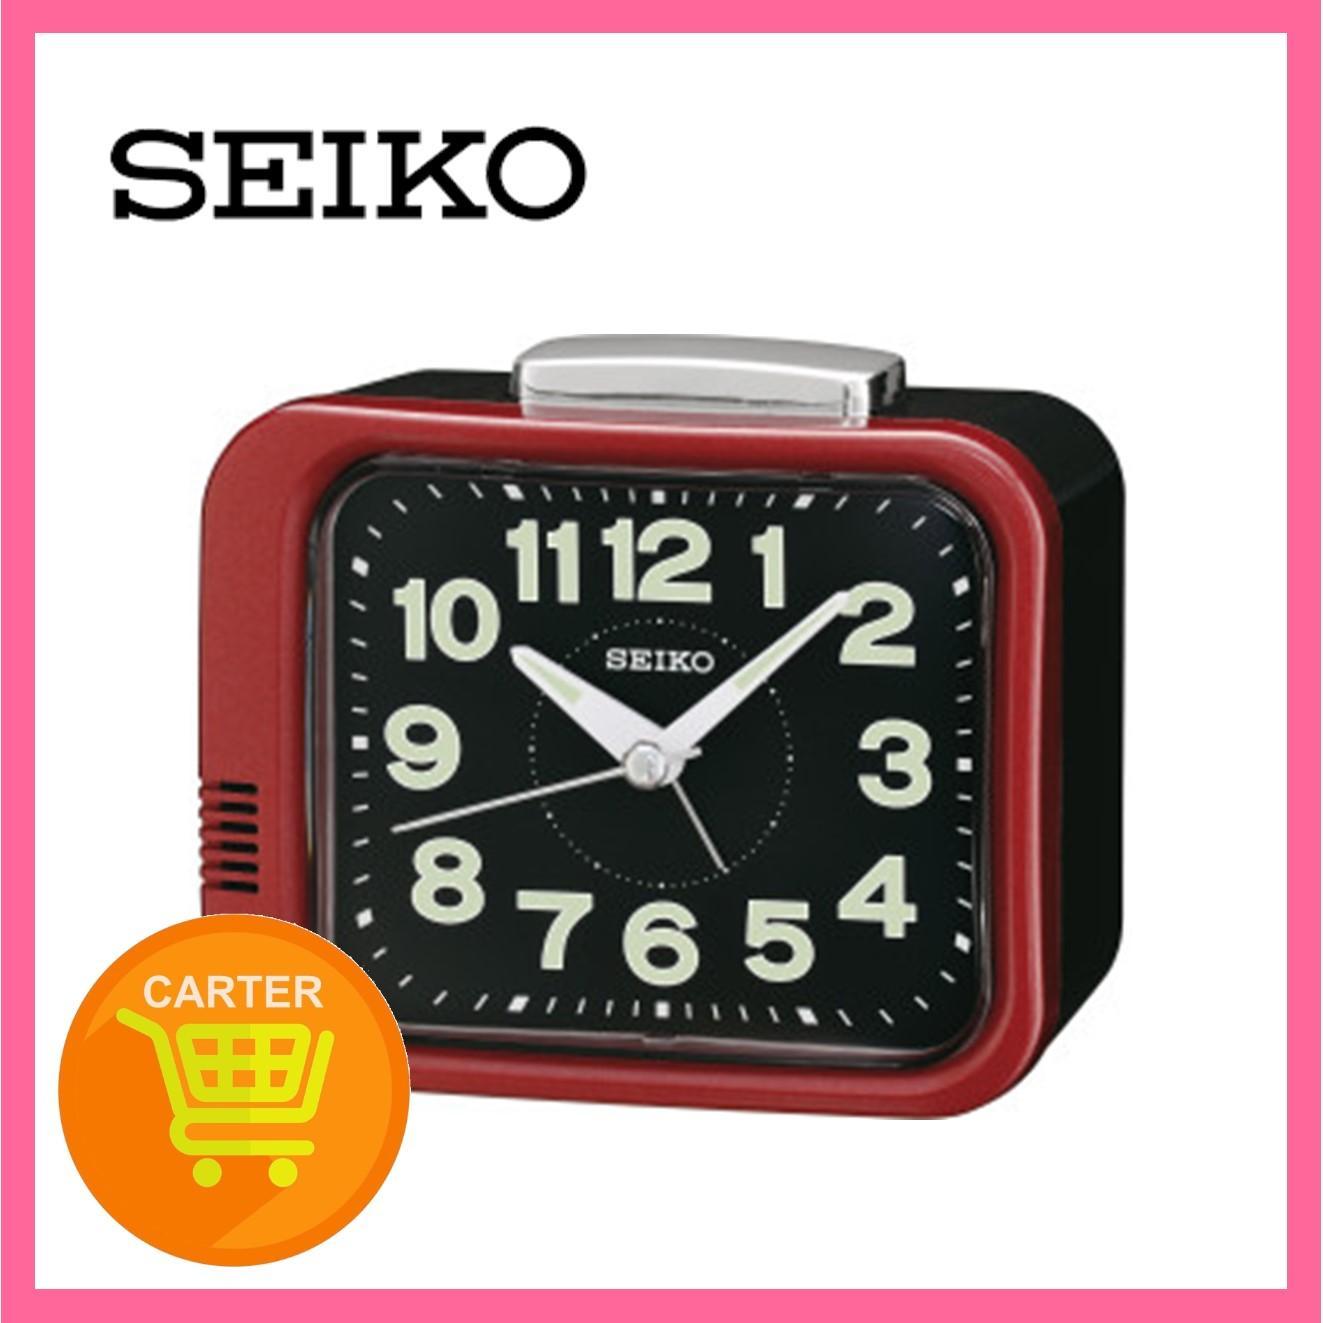 SEIKO QHK028 SILENT MOVEMENT ALARM CLOCK (BELL) RED